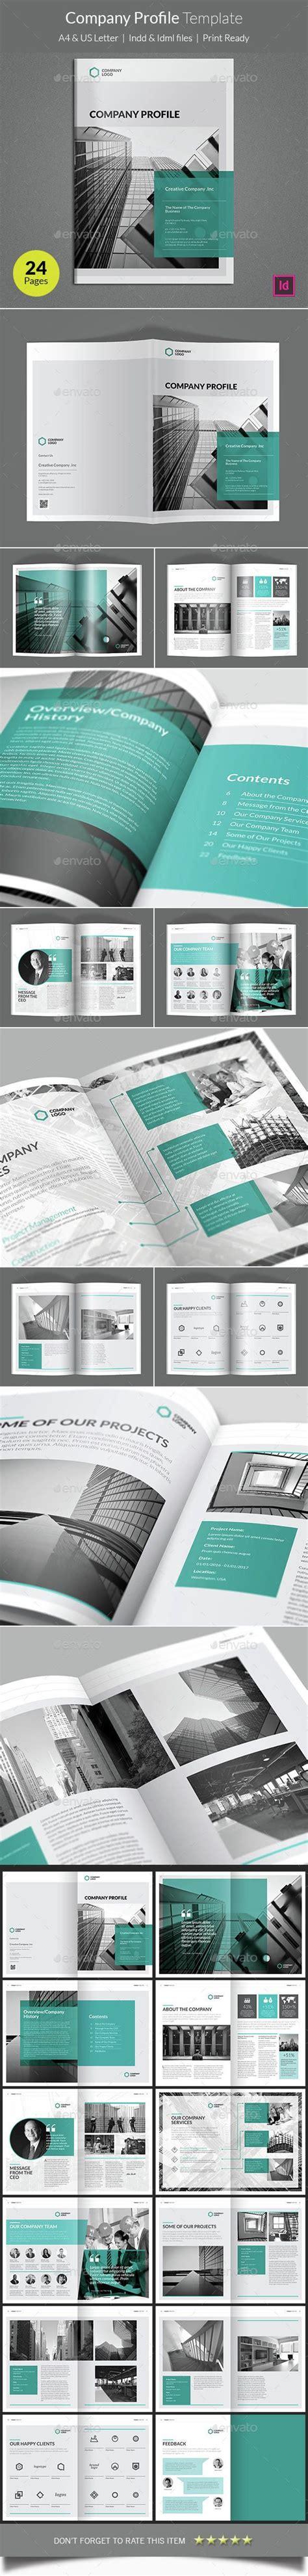 company profile indesign template company profile template company profile brochure